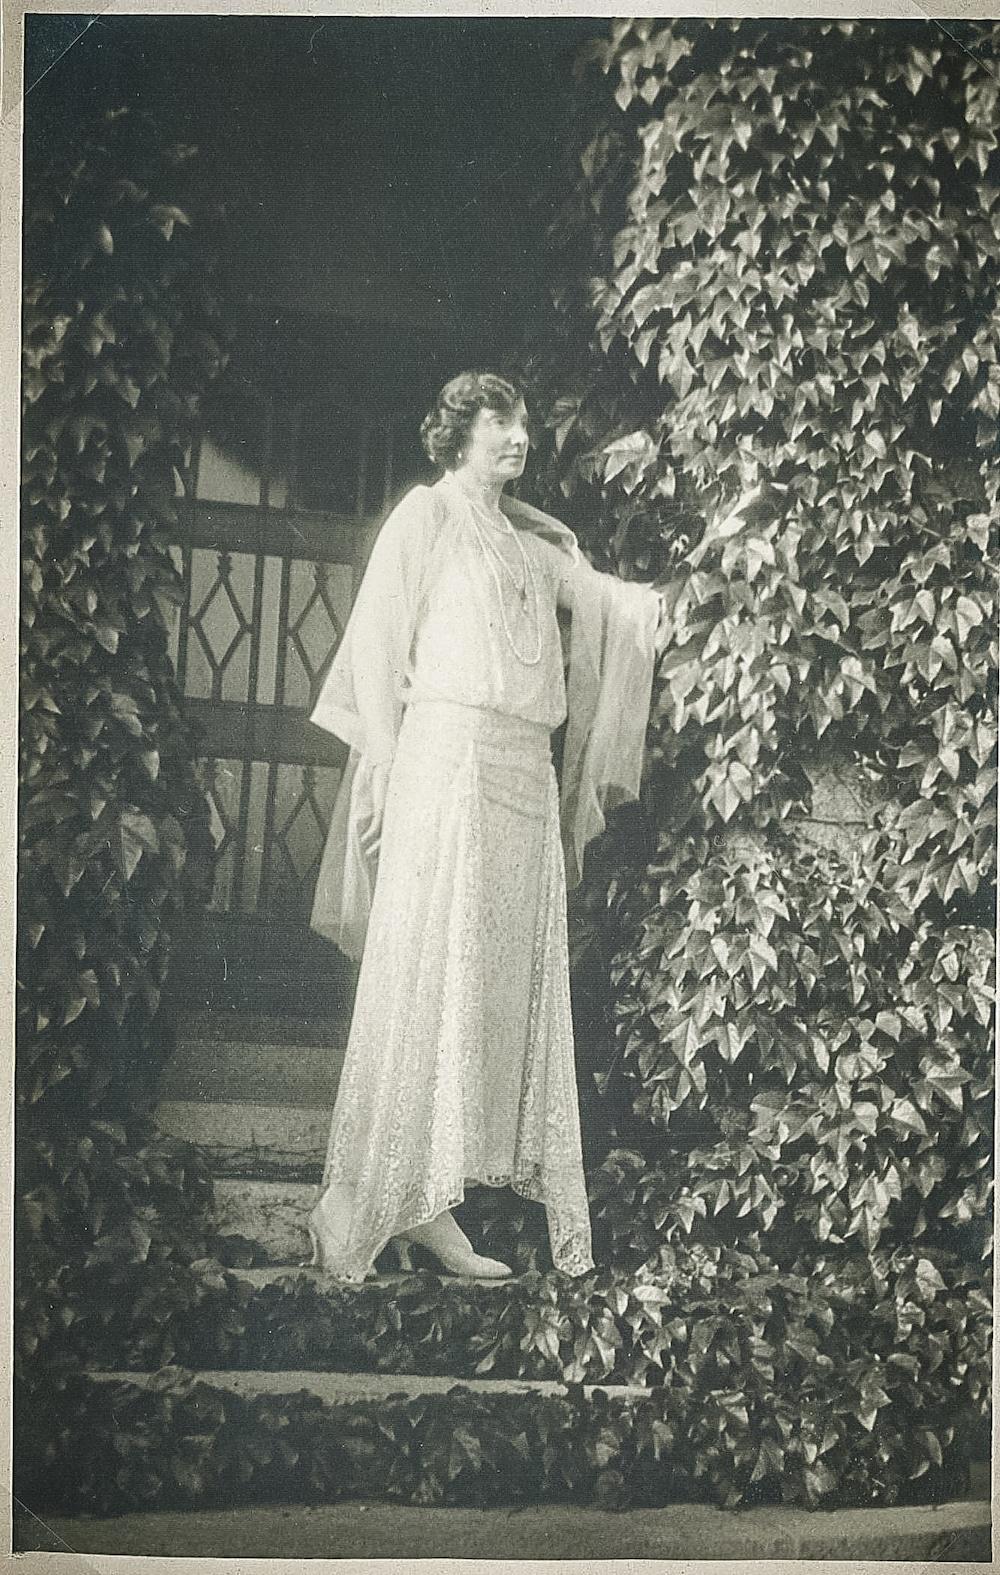 1920-talet mode kvinnor